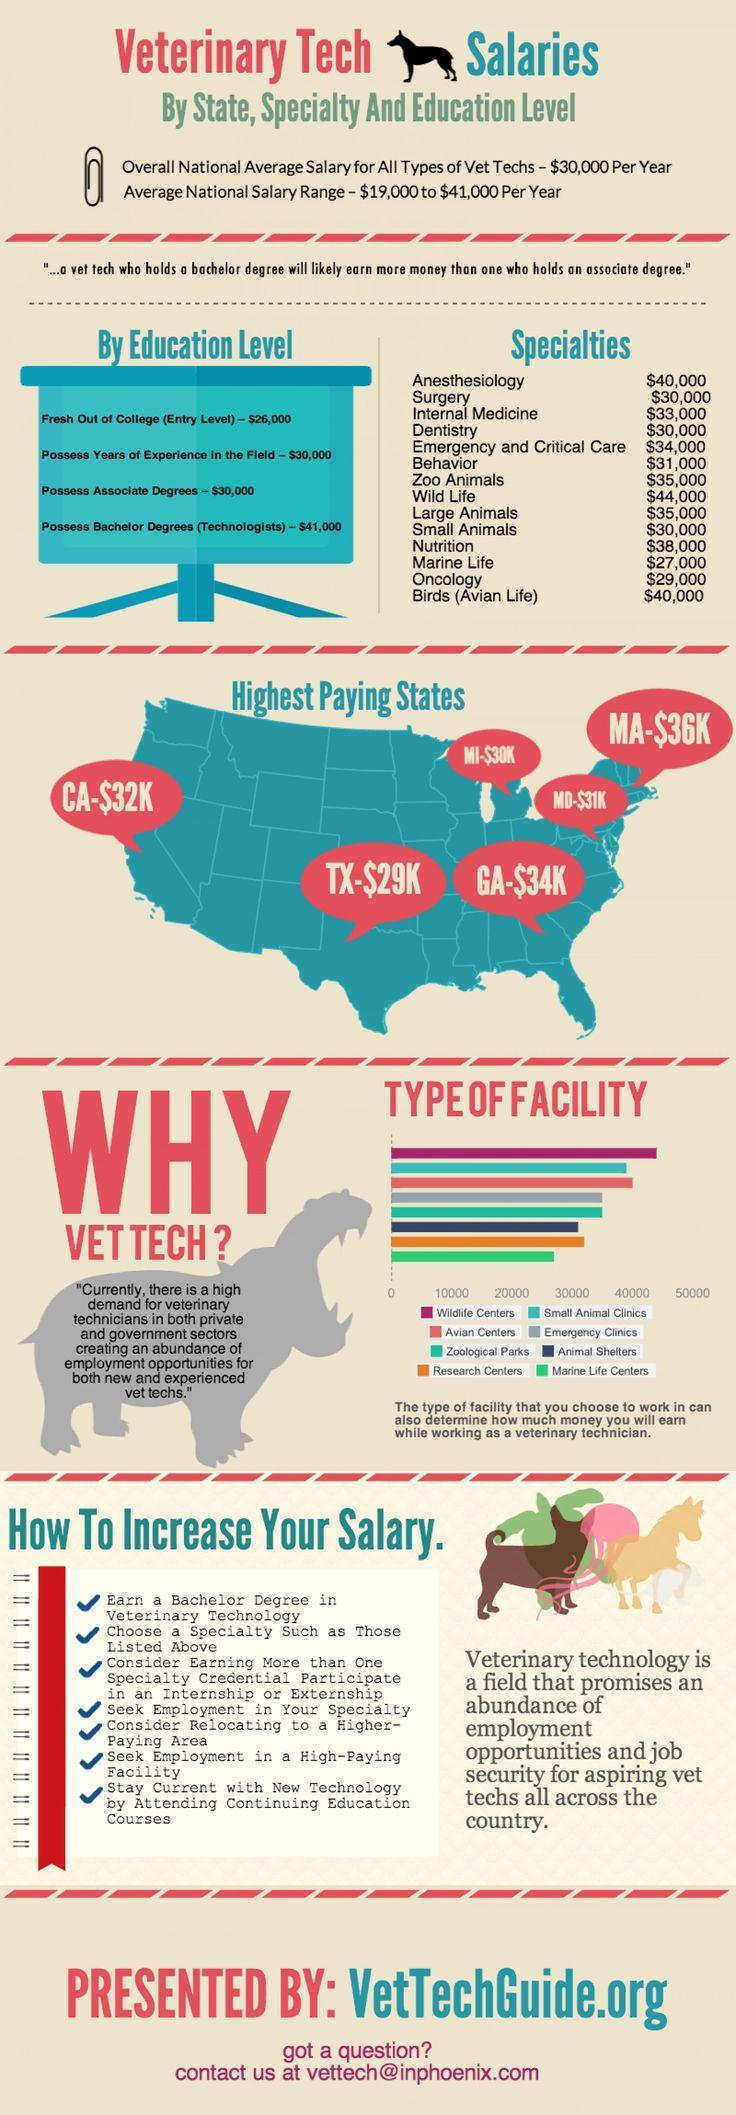 Veterinary Technician Salary Guide Infographic